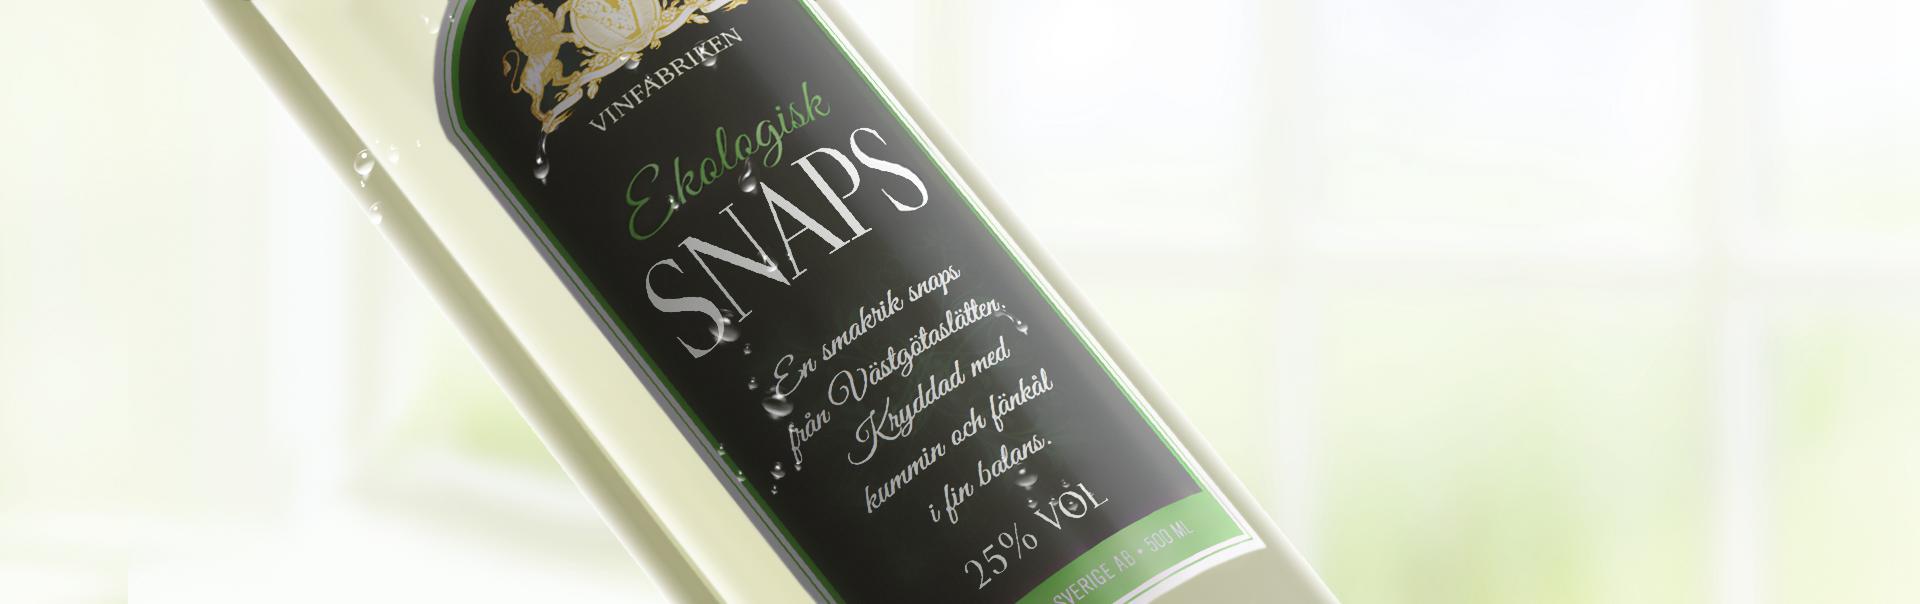 Vinfabriken_ekologisk_Snaps